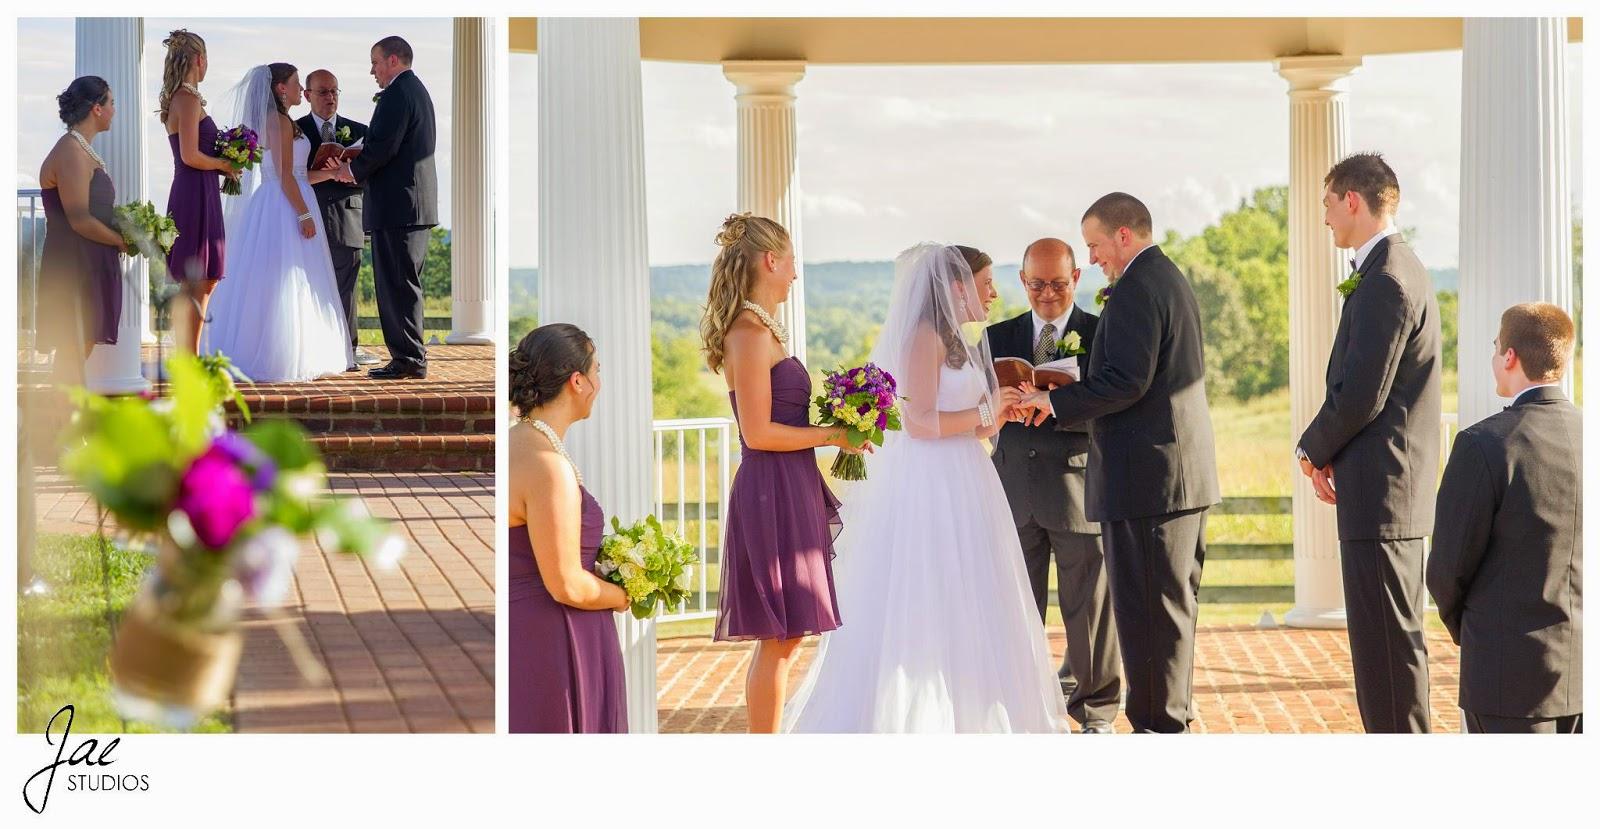 Jonathan and Julie, Bird cage, West Manor Estate, Wedding, Lynchburg, Virginia, Jae Studios, outdoors, ceremony, flowers, brick, vows, rings, bridesmaids, groomsmen, pastor